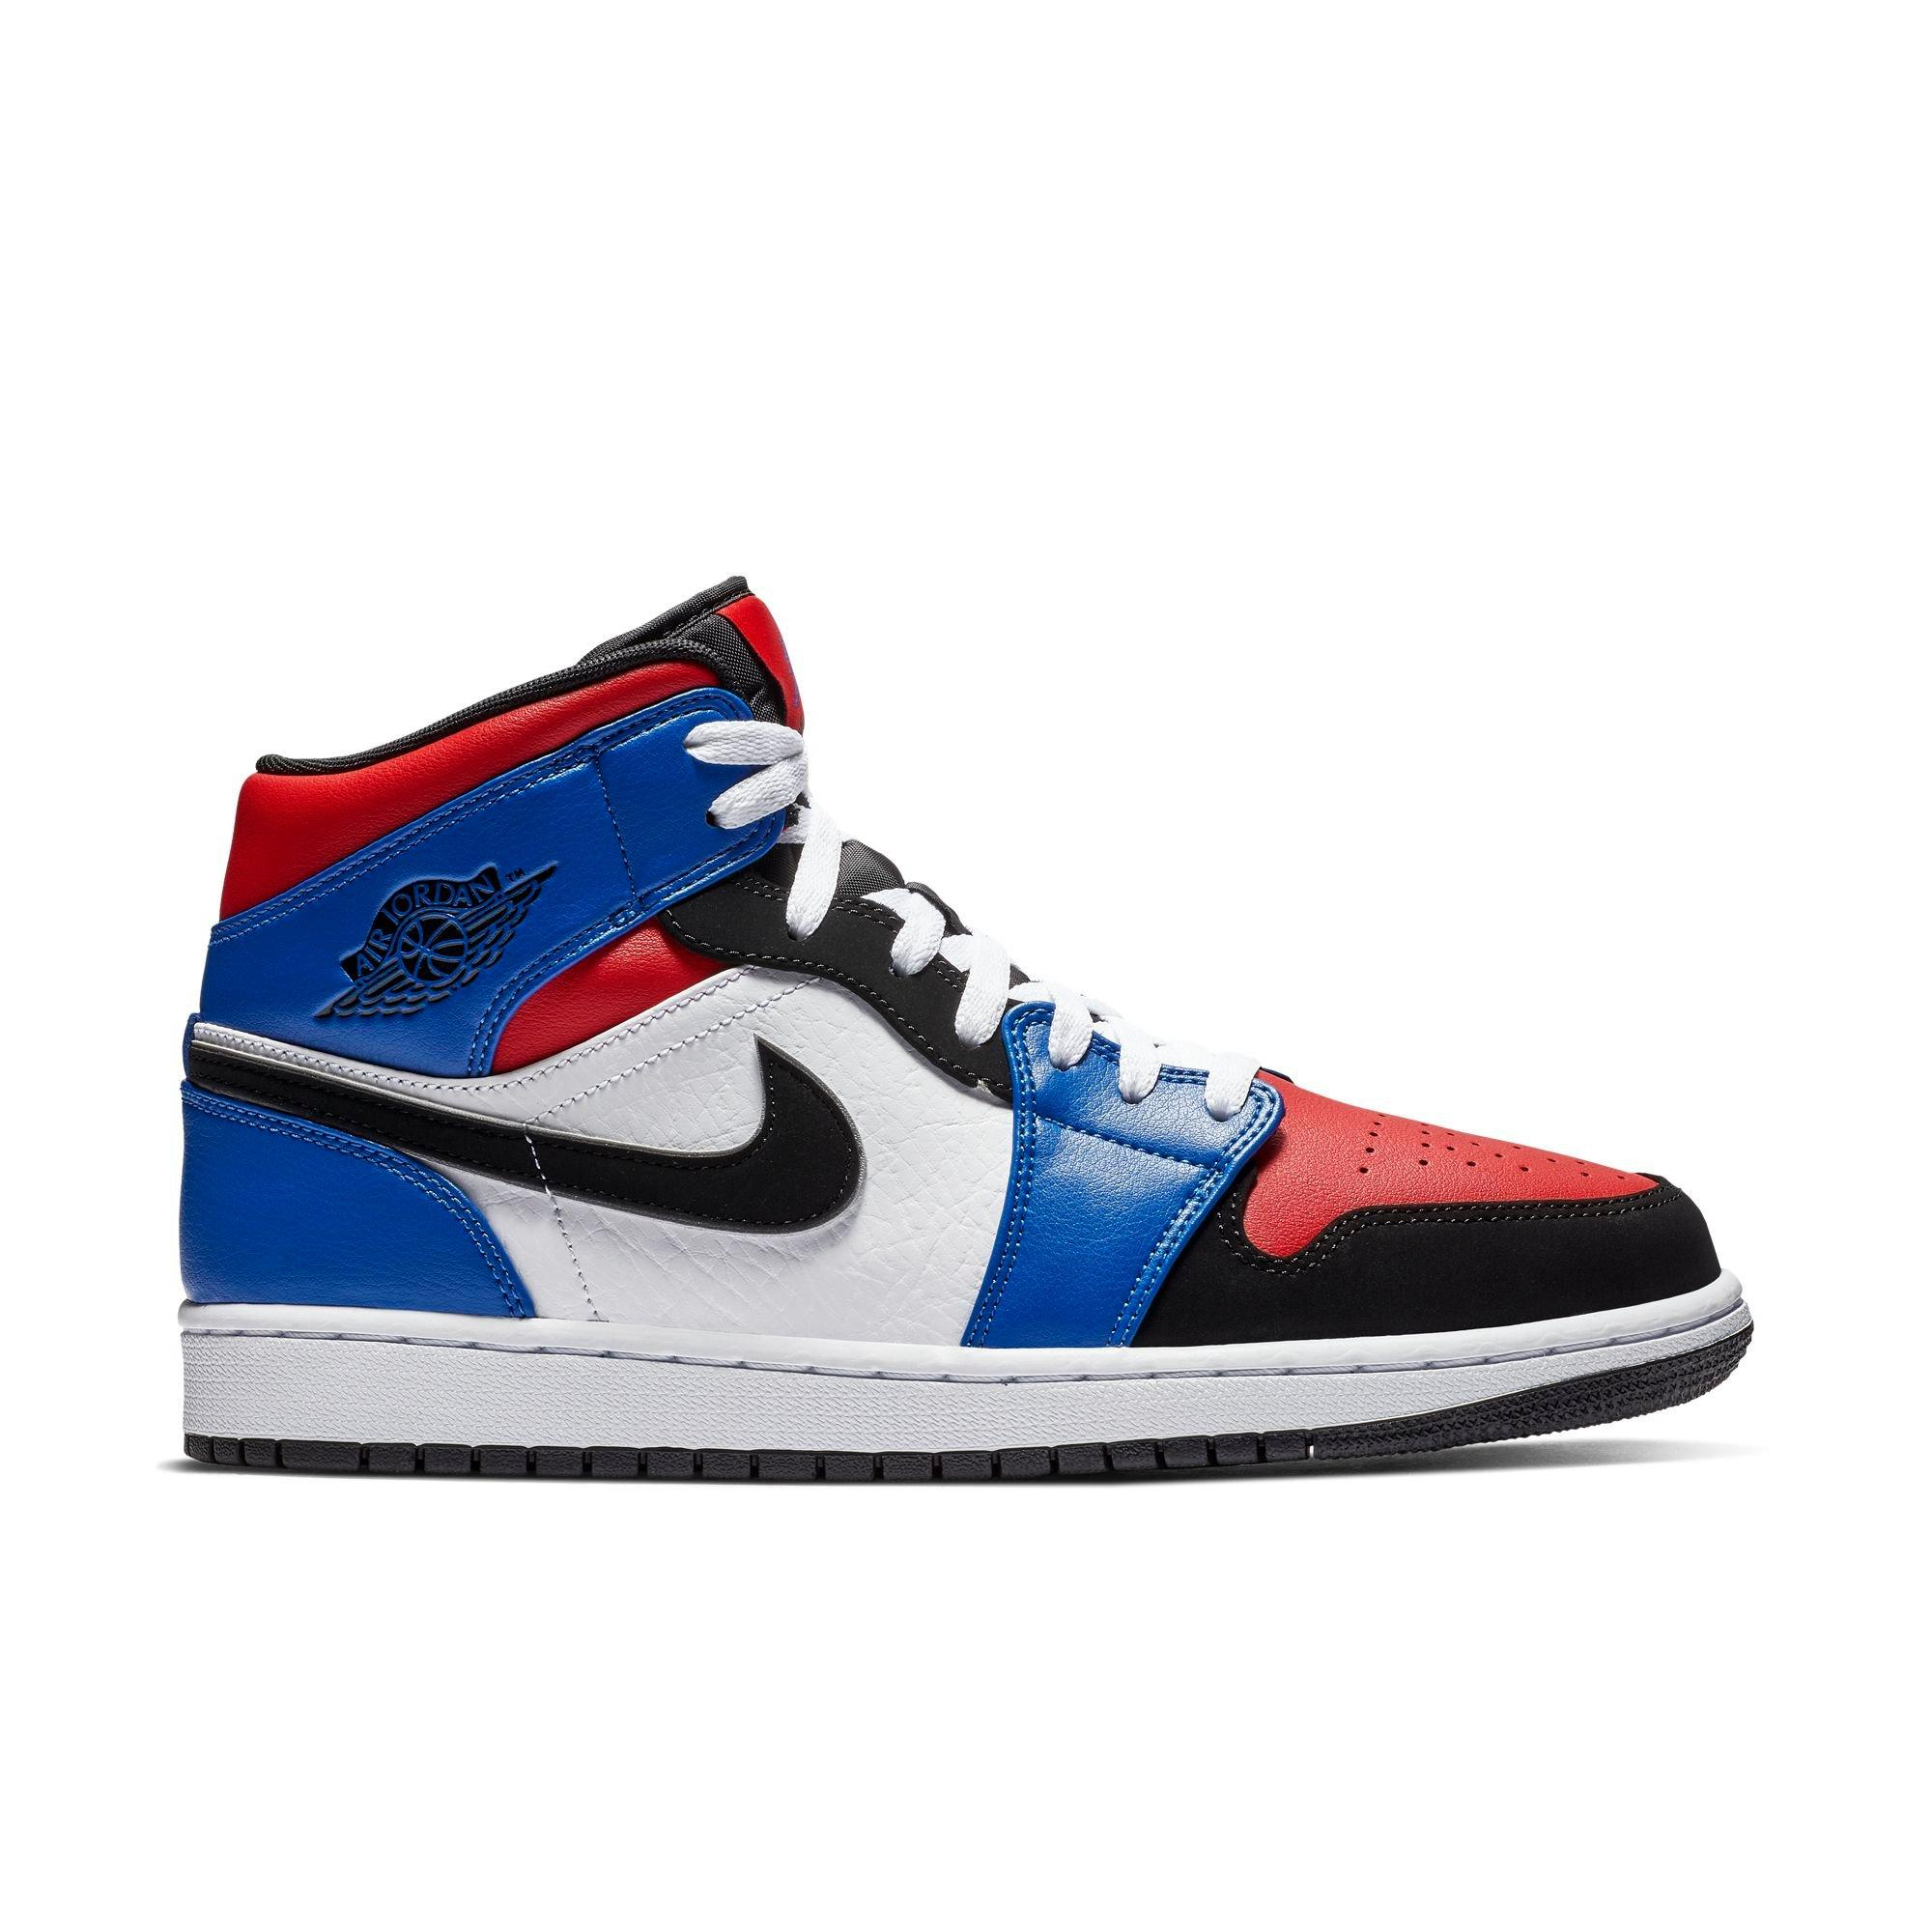 red and blue jordan 1